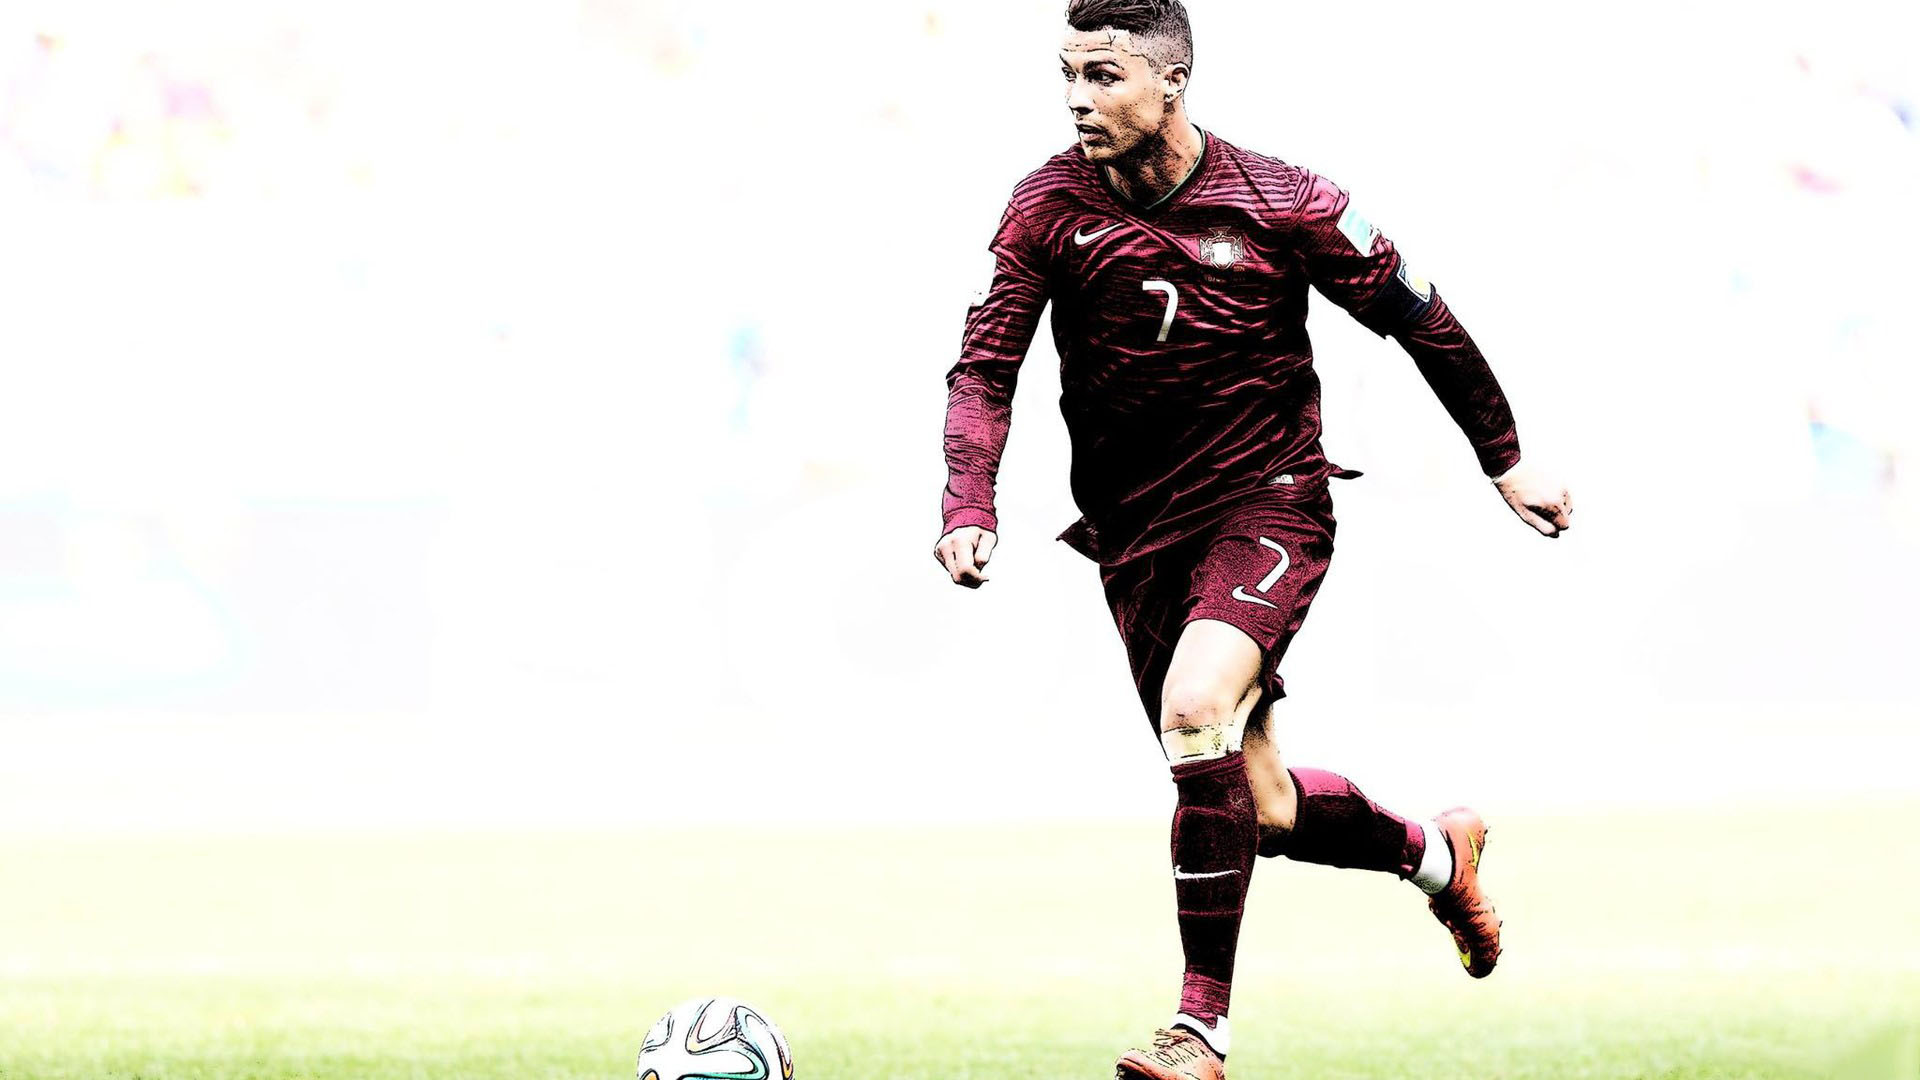 Ảnh nền cầu thủ cristiano ronaldo